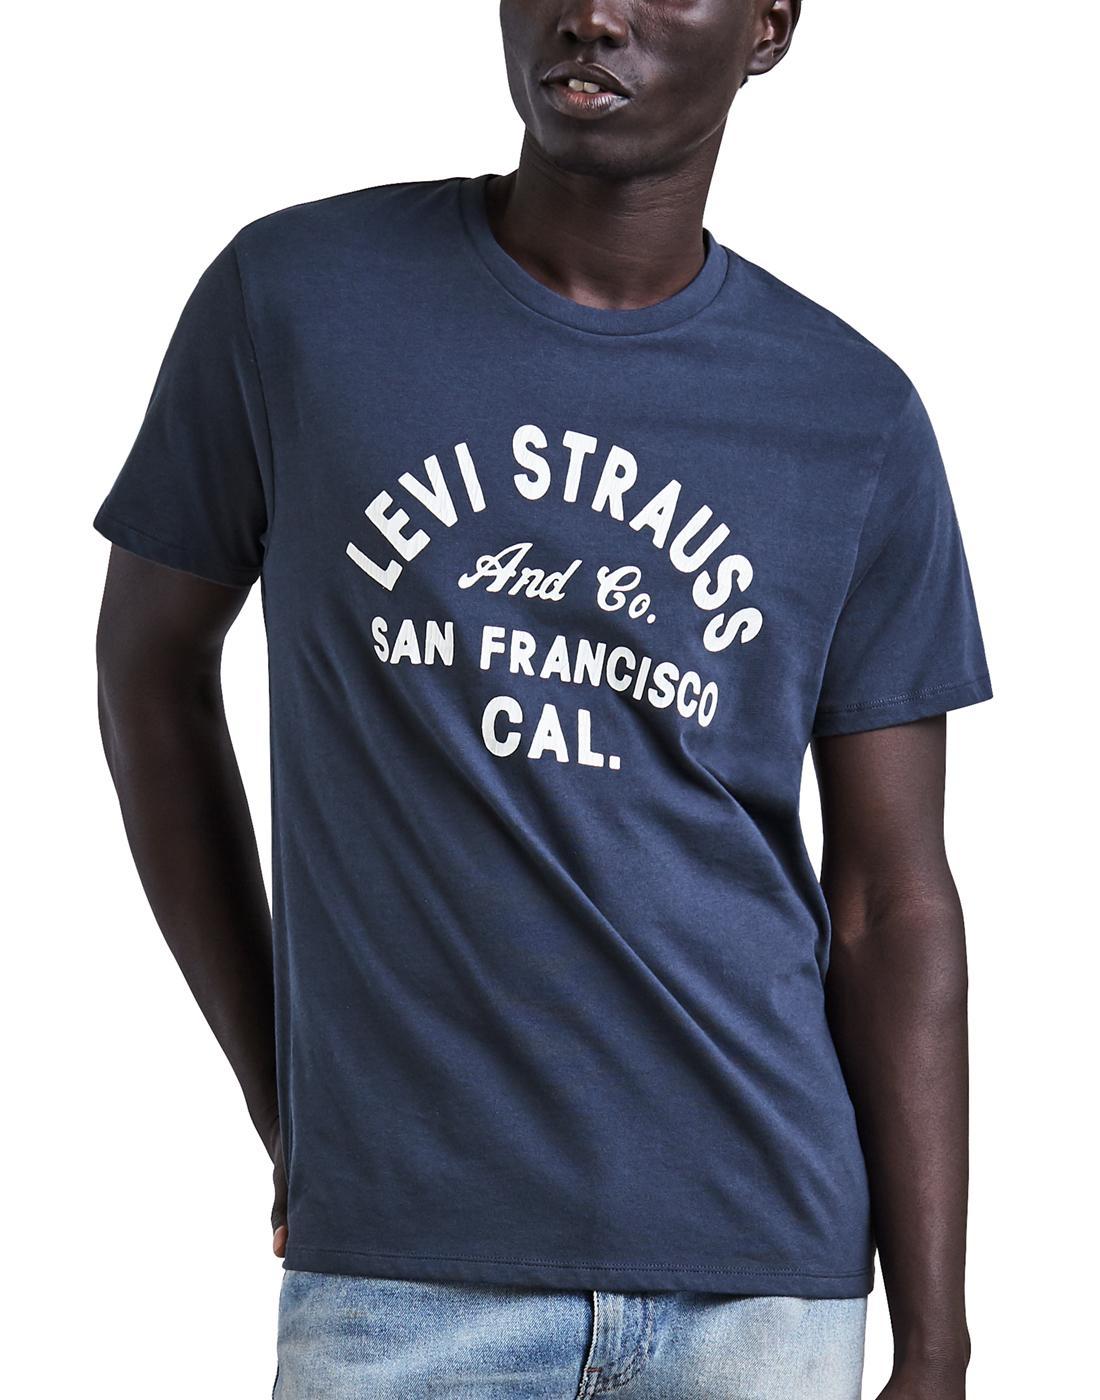 LEVI'S® Mens Retro Indie Levi Strauss T-Shirt Navy